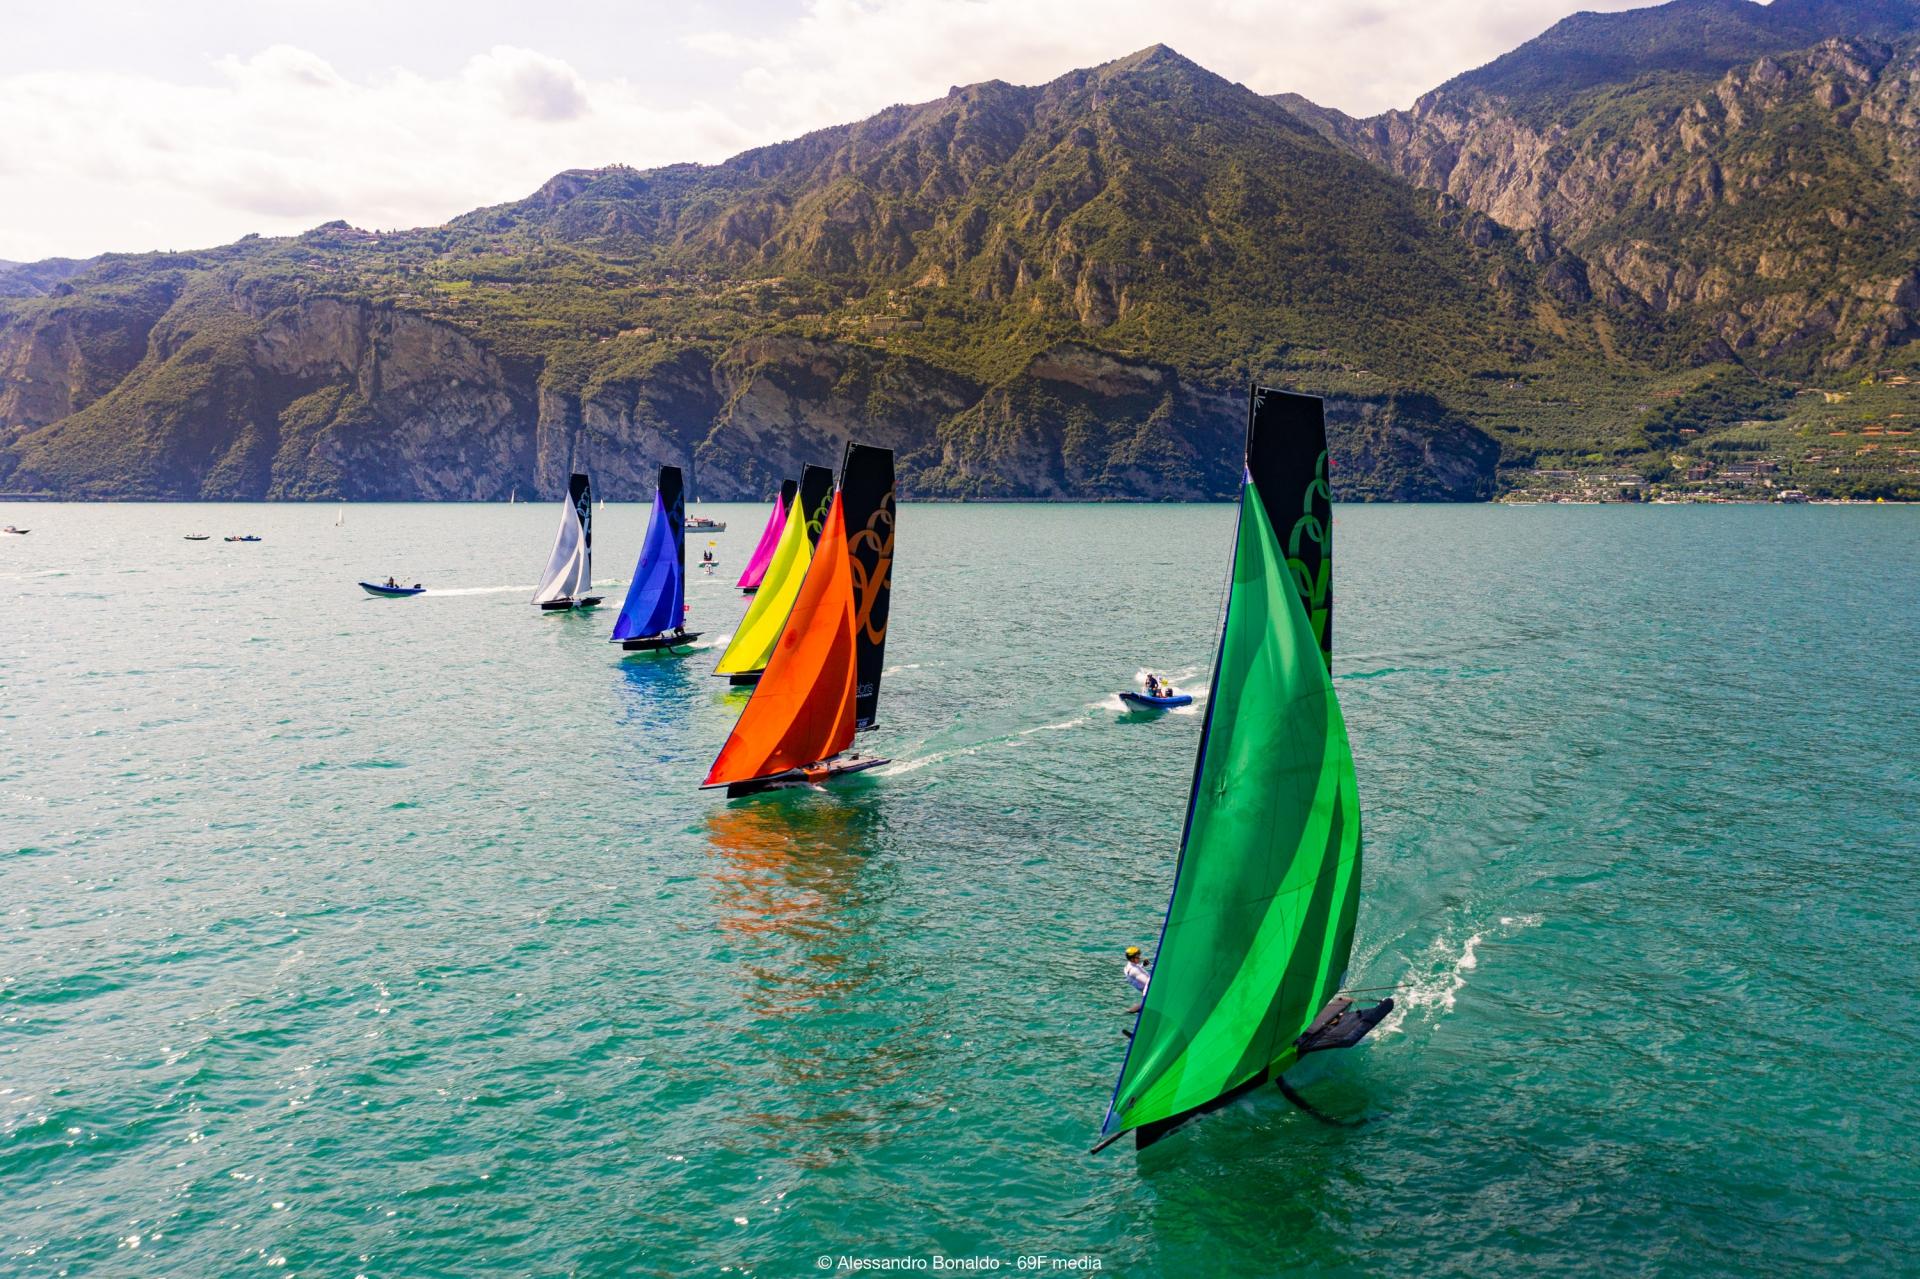 Young Azzurra si qualifica per la finale della Youth Foiling Gold Cup Act 2 - MEMBER NEWS - Yacht Club Costa Smeralda